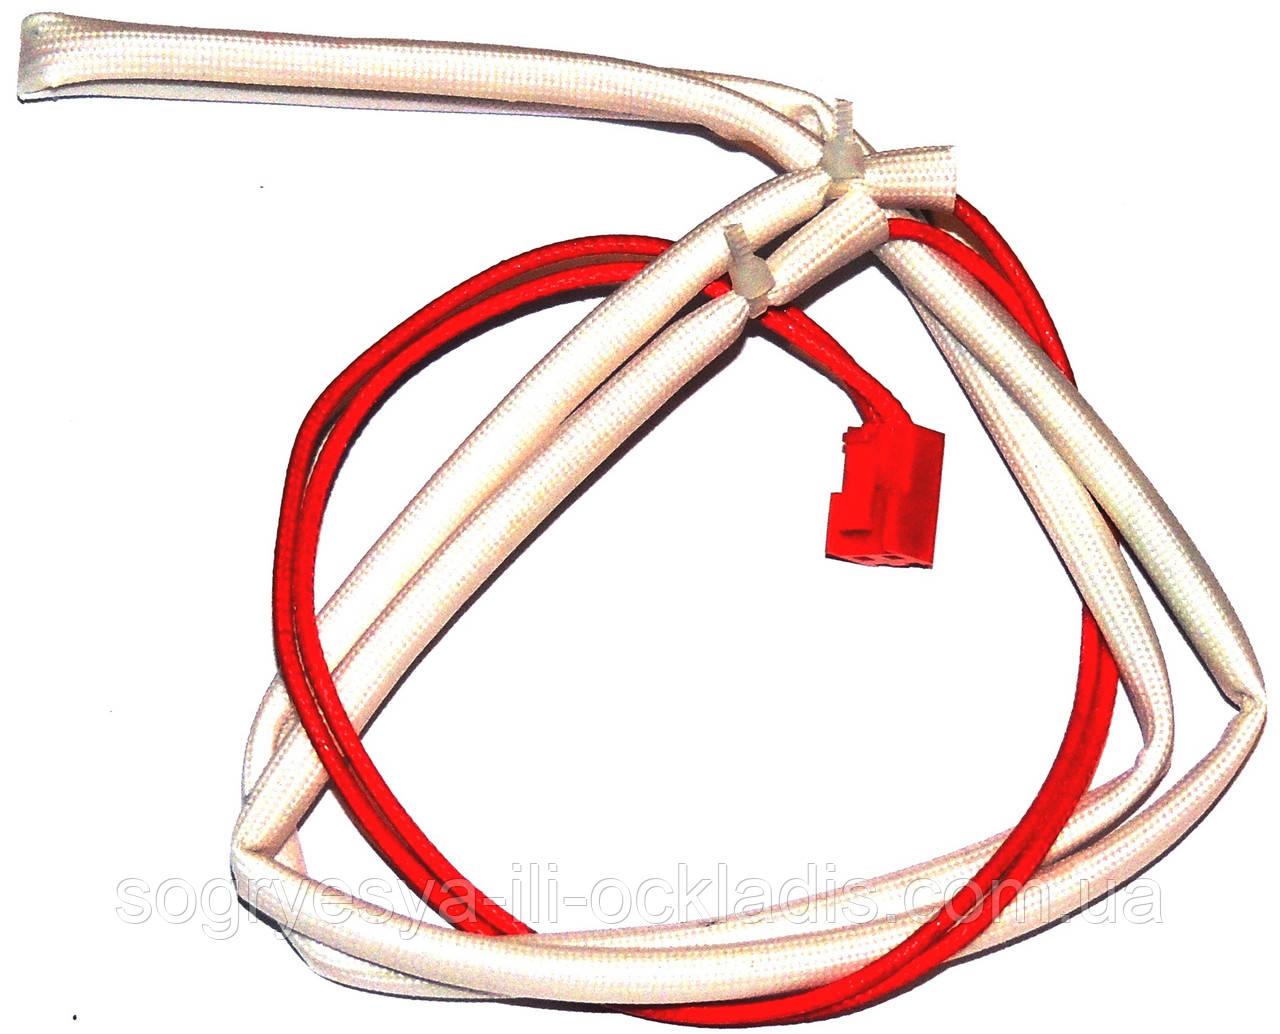 Термопредохранитель (антизаморозка) Ariston Marco Polo Gi7S 11,16L FFI NG, артикул 65158030, код сайта 0538